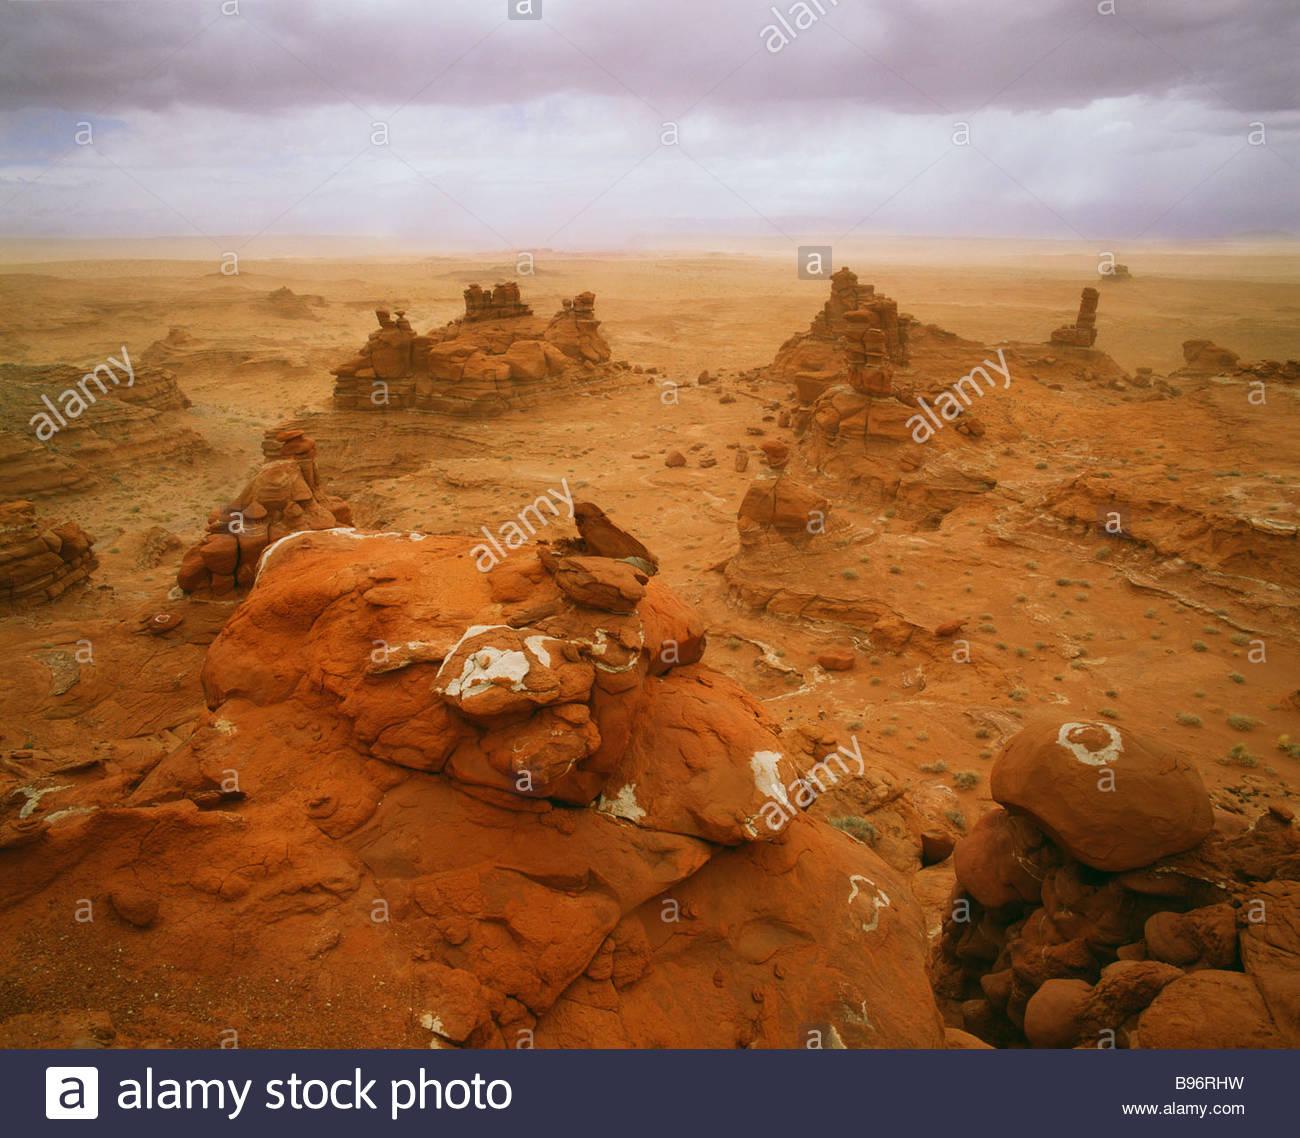 Frühling-Sandsturm entlang der Klippen Adeiii Eechii Western Painted Desert Navajo Indian Reservation Arizona Stockfoto